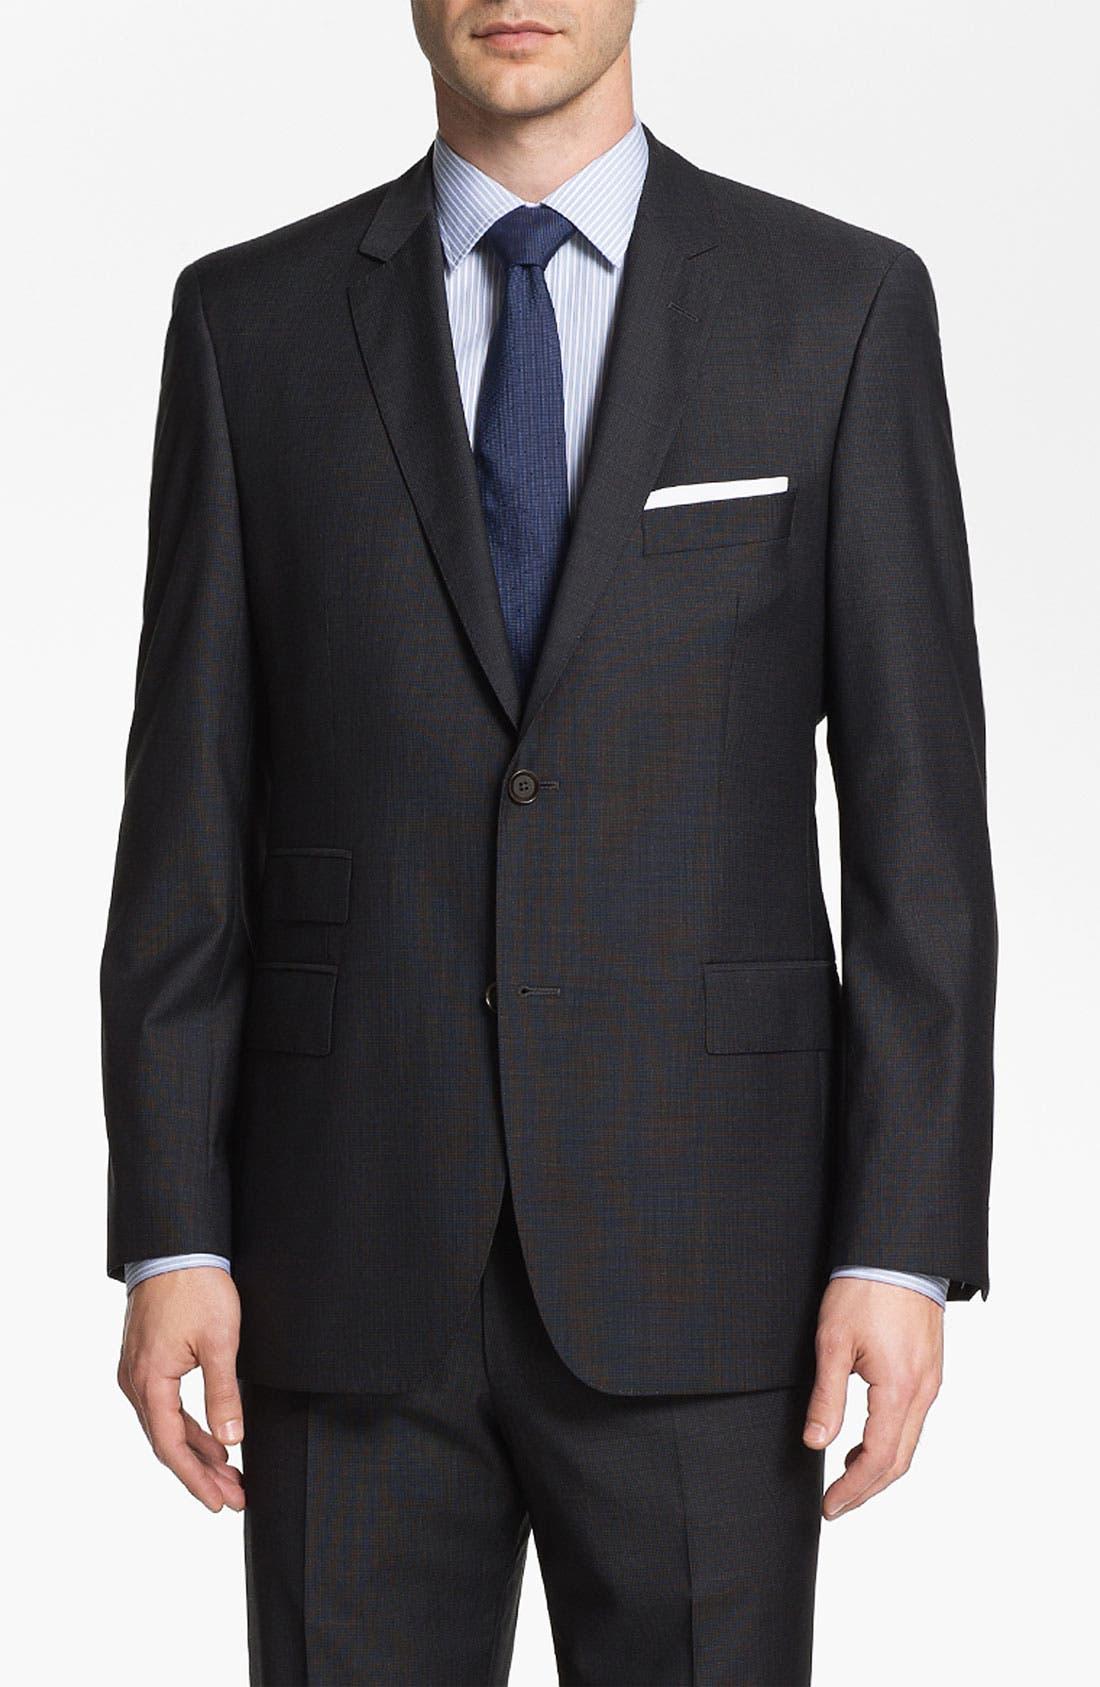 Main Image - BOSS Black 'Edison/Power' Wool Suit